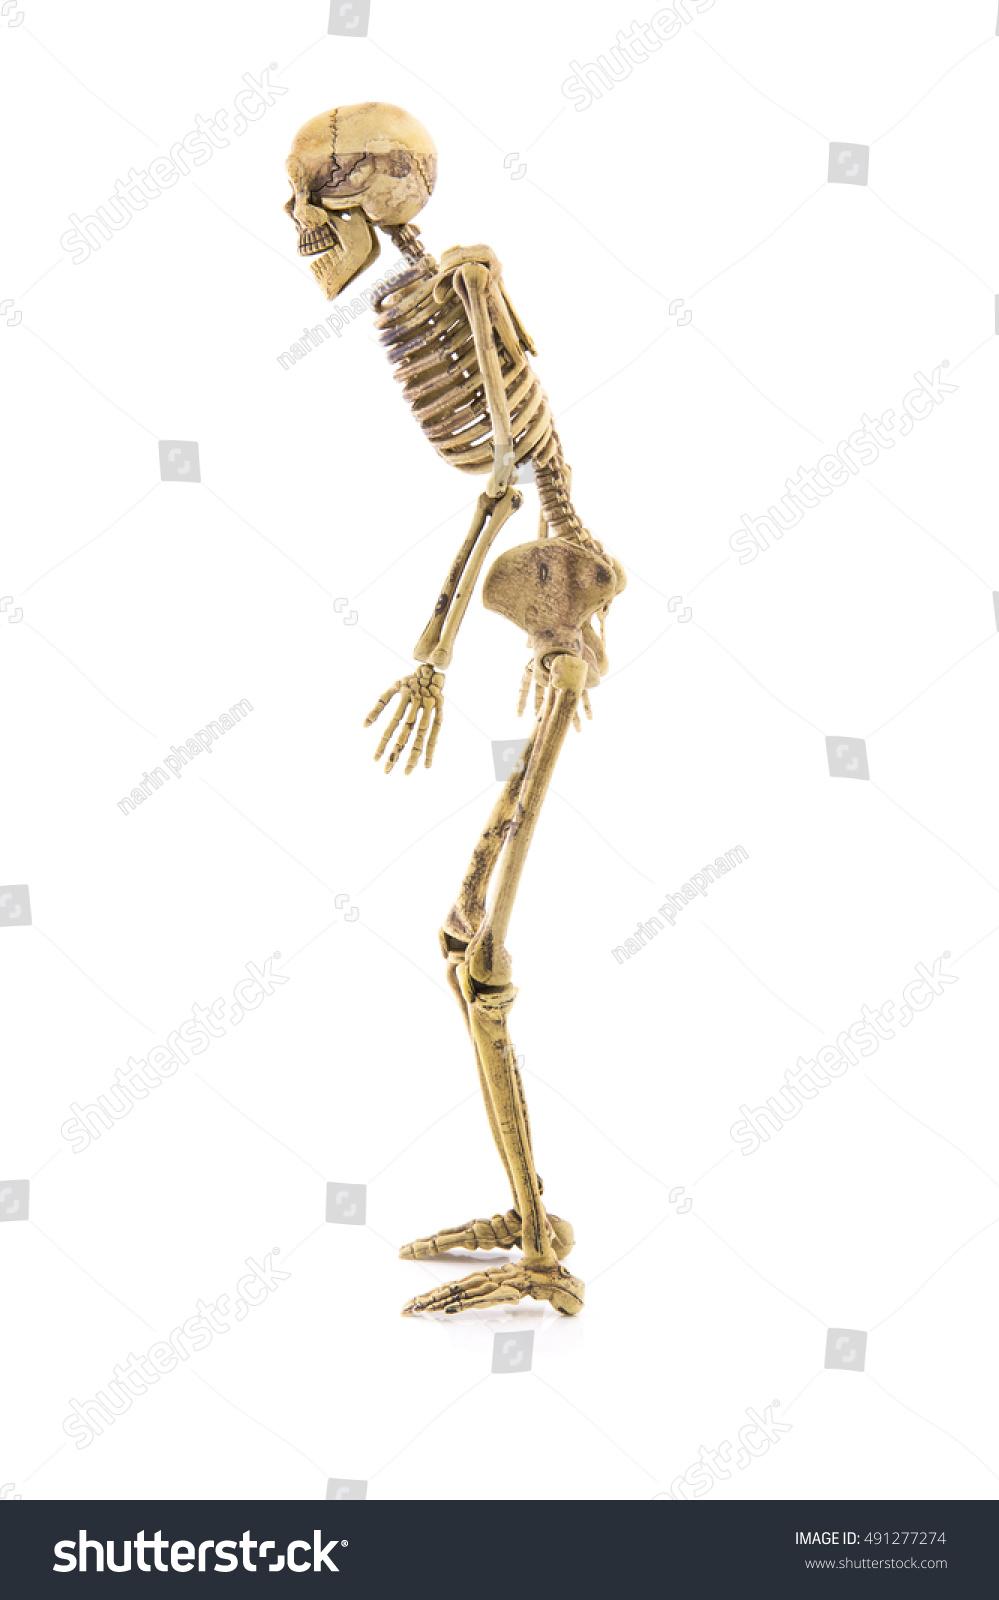 Anatomy Left Side Body Skeleton Human Stock Photo (Edit Now ...